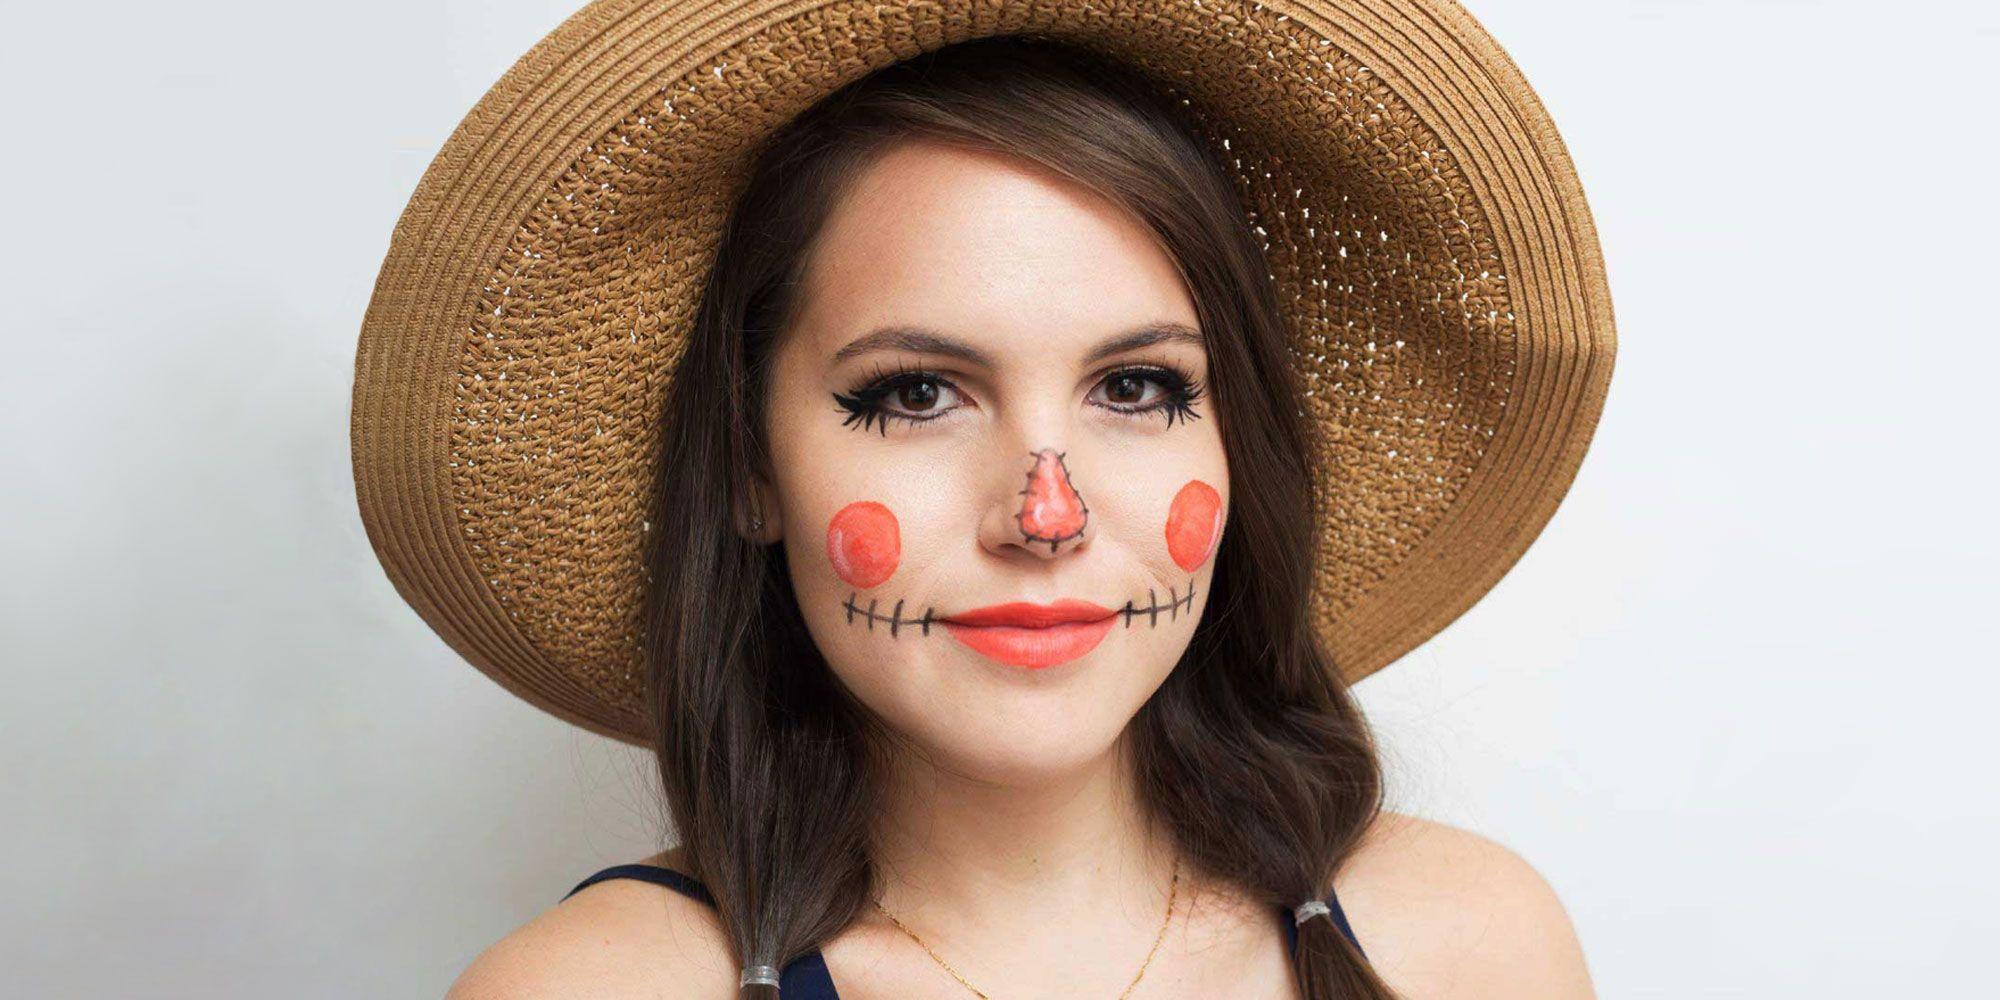 Scarecrow Halloween Makeup Tutorial for 2019 , Easy DIY